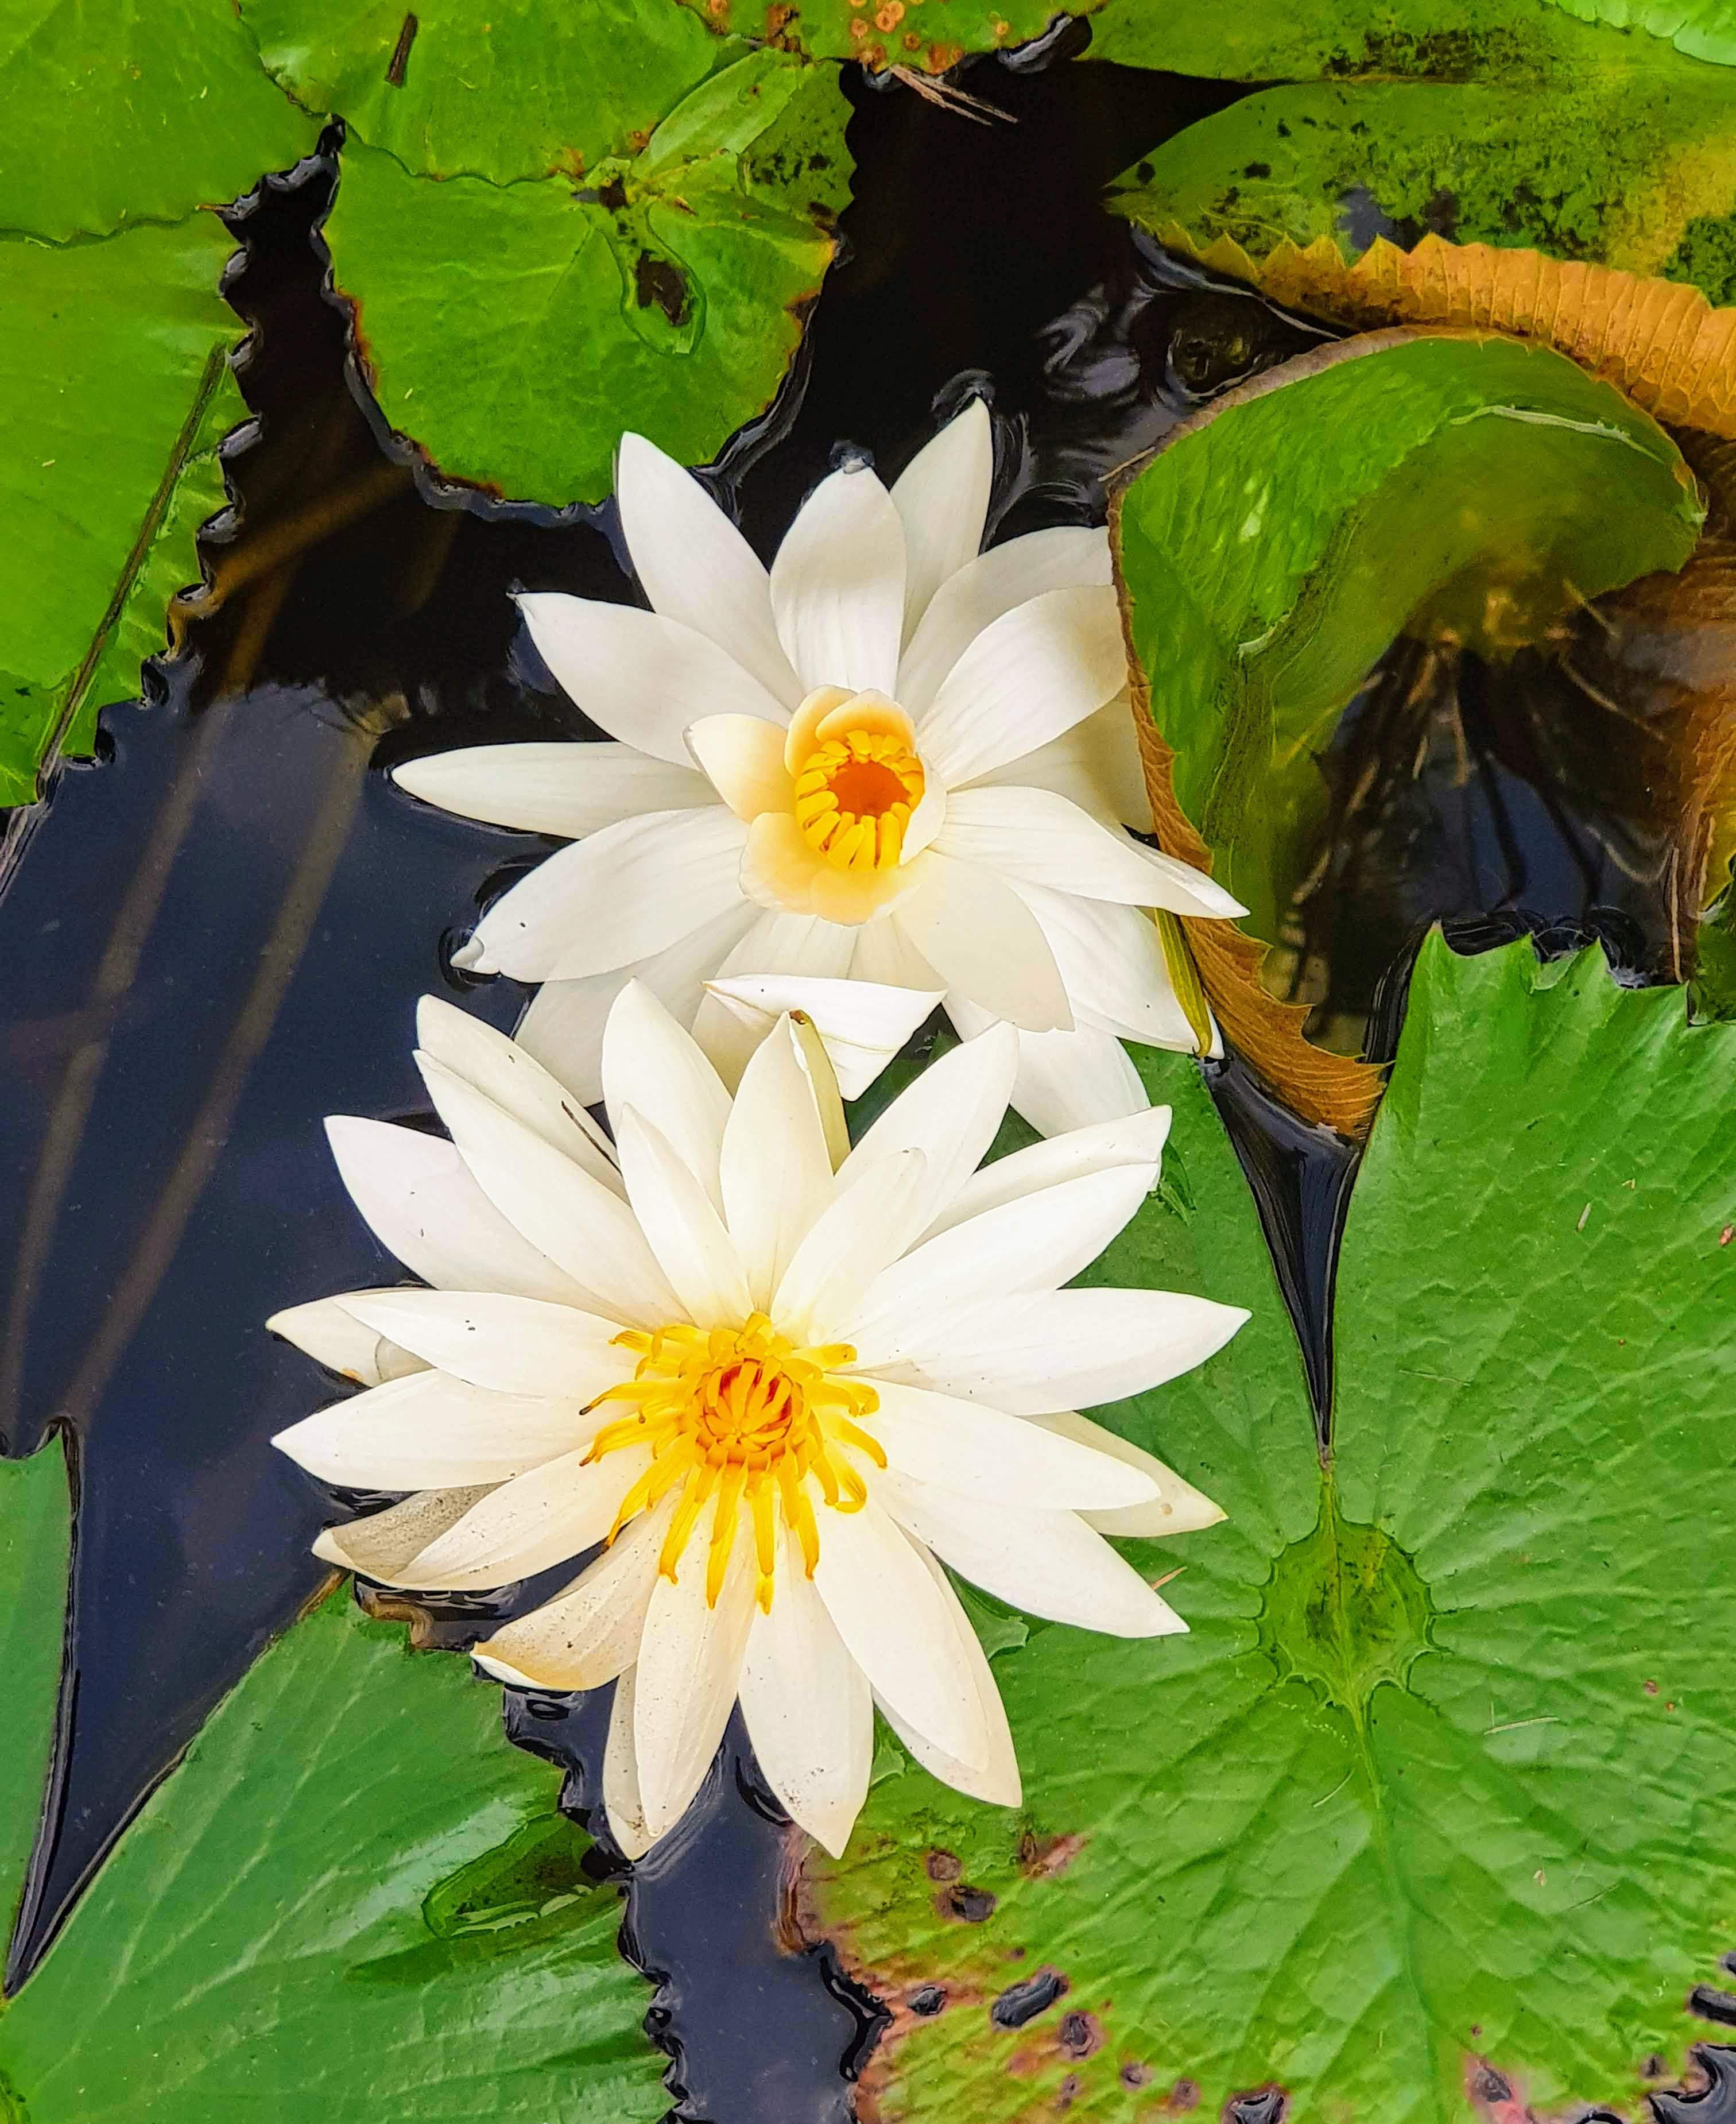 travel light up life business blogger bali lilypad pond culture